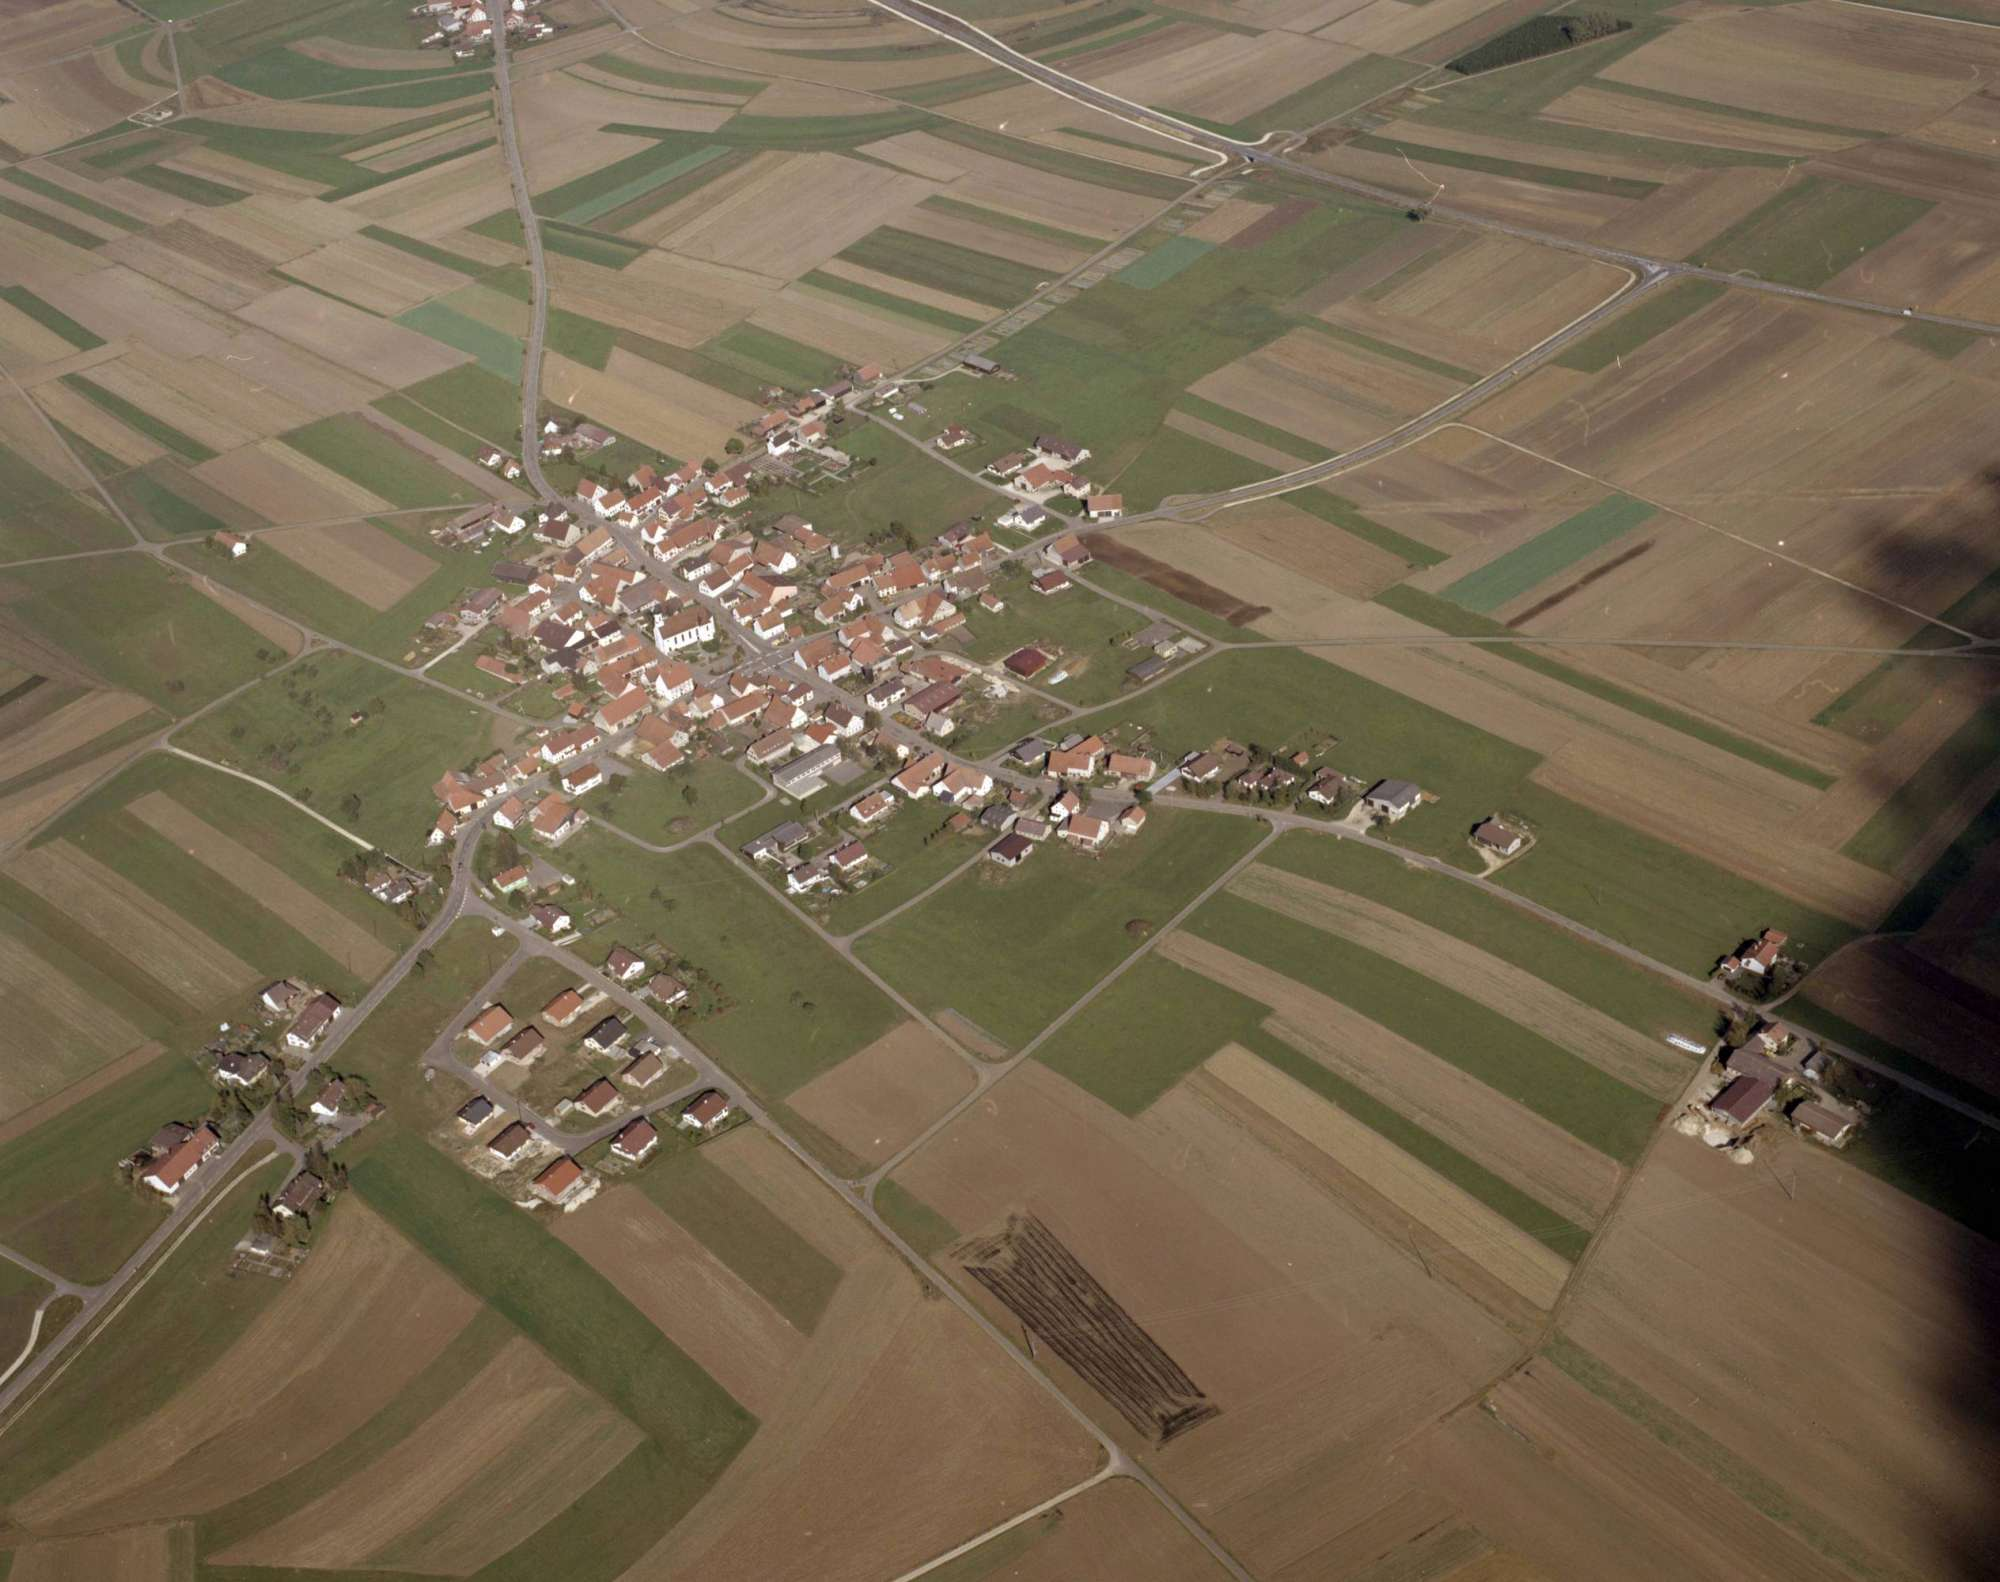 Feldhausen, Luftbild, Bild 1